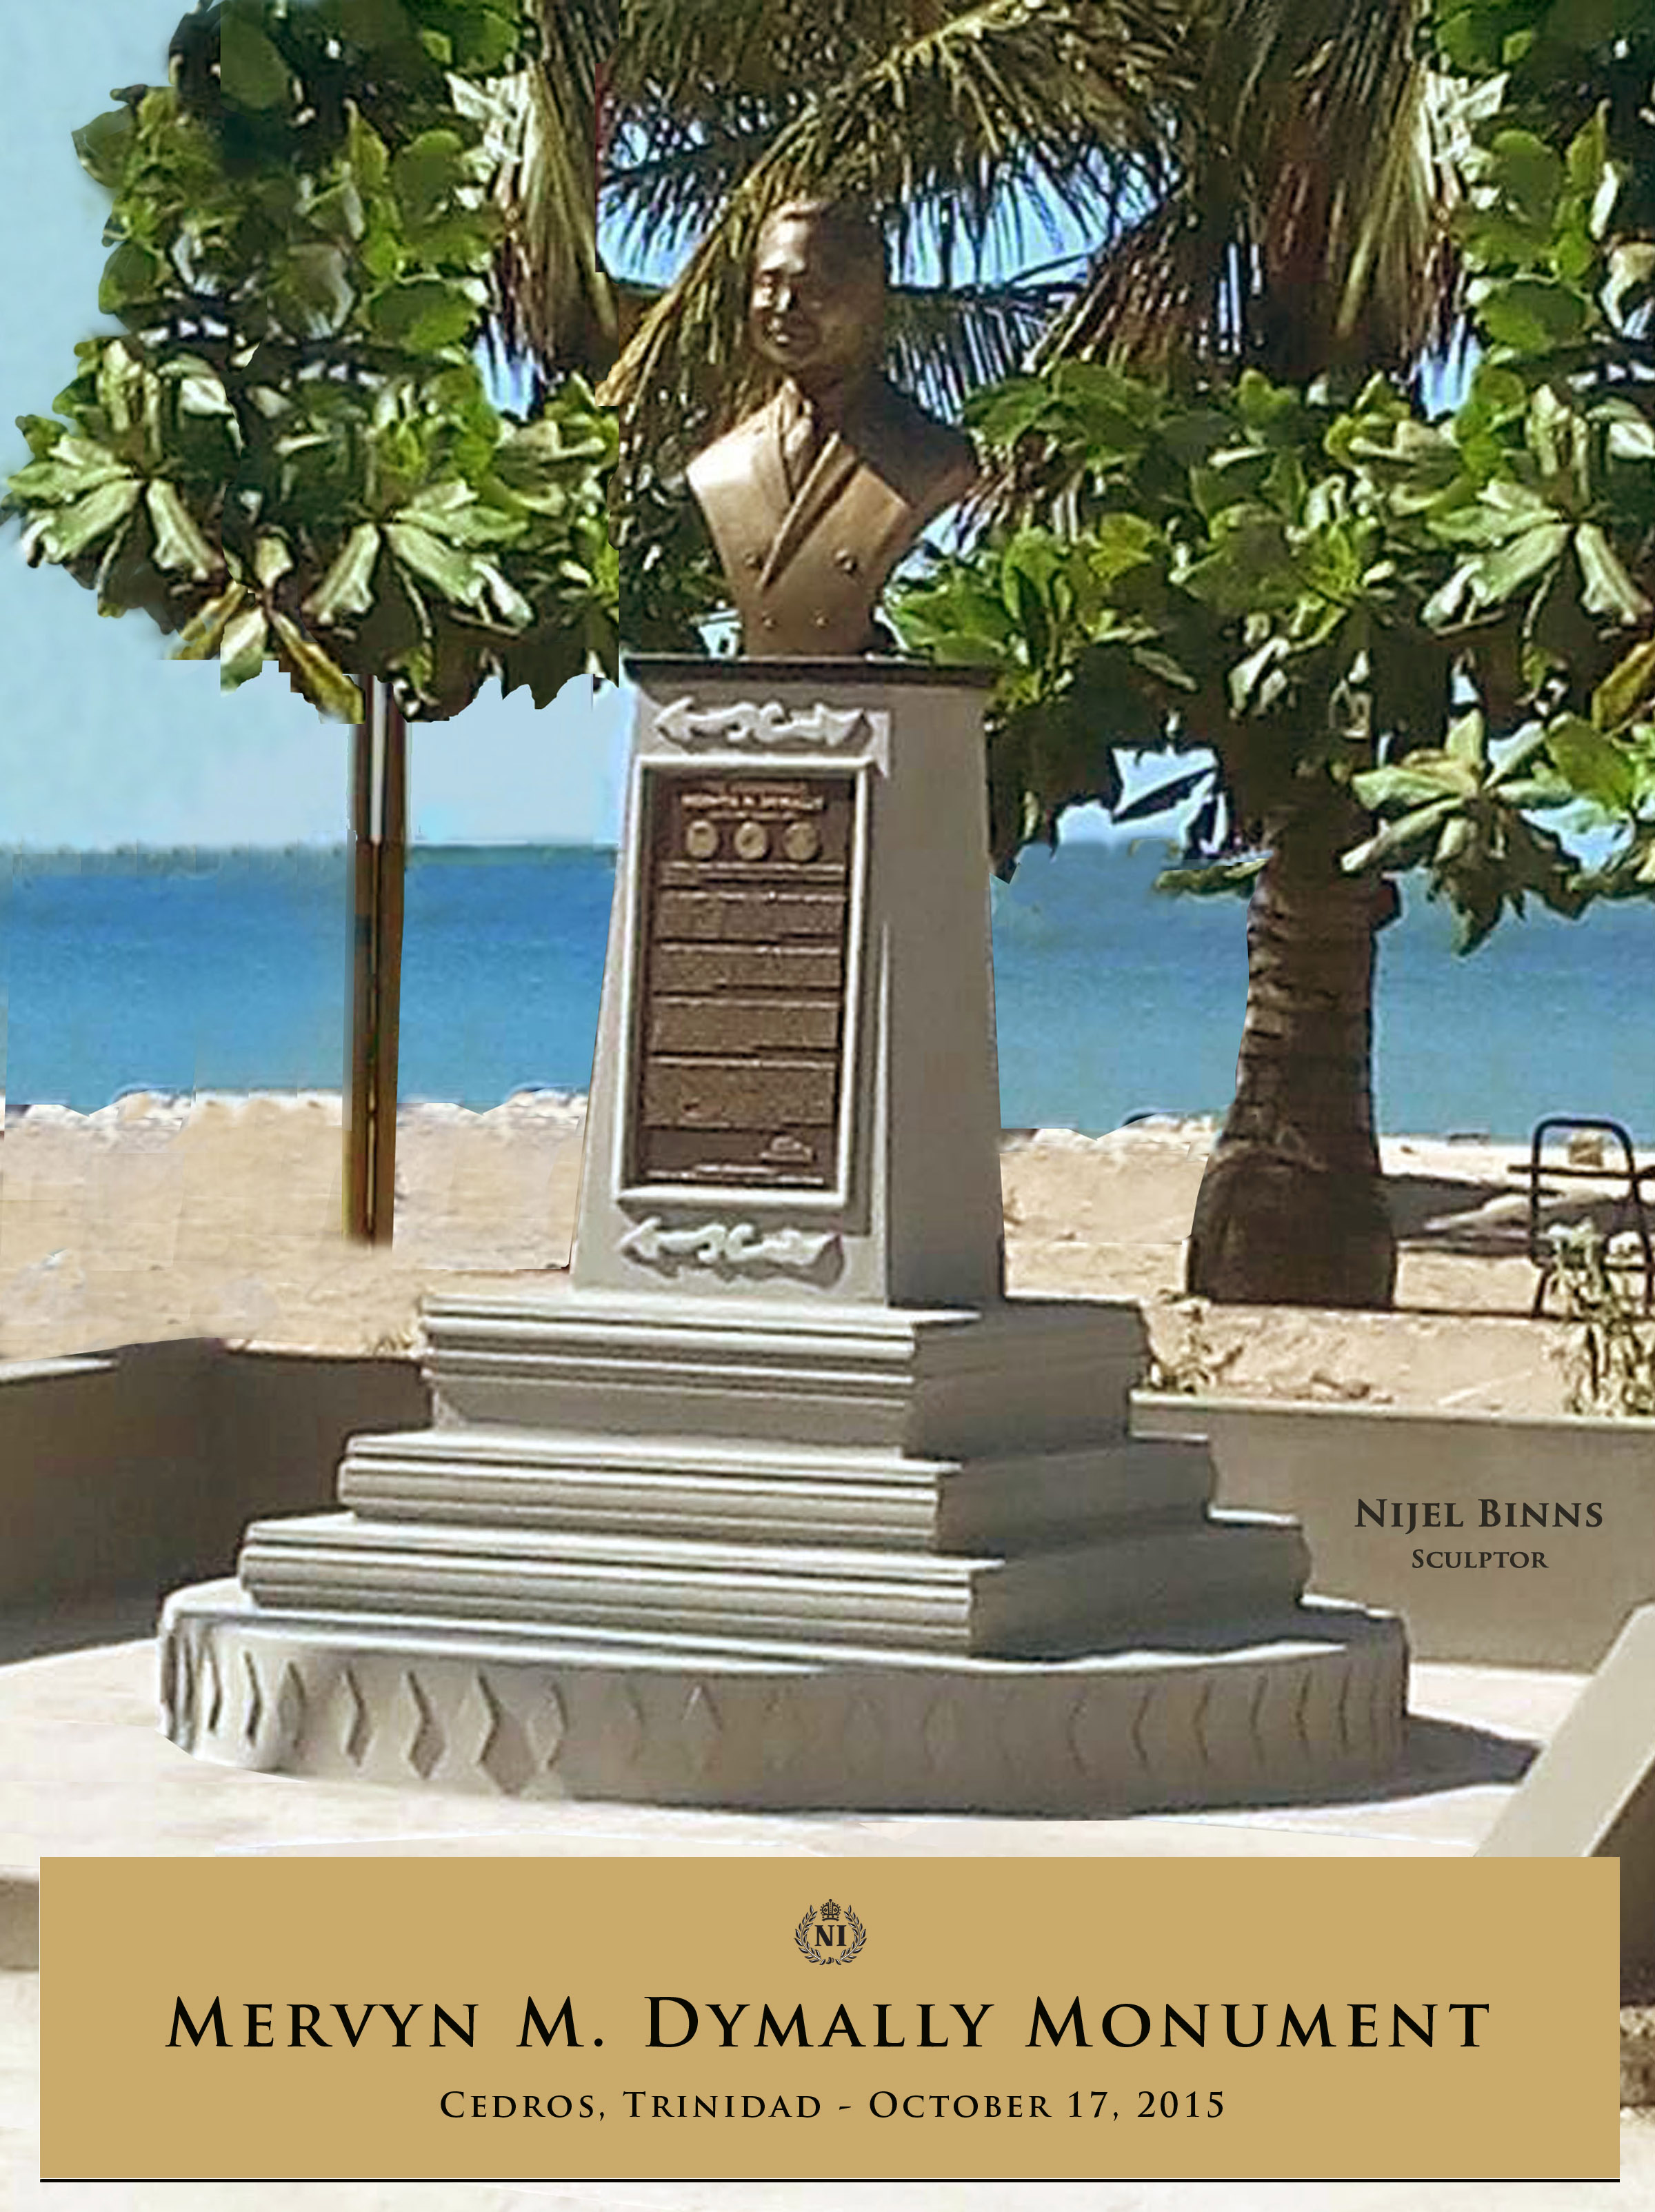 MMD-monument-Trinidad